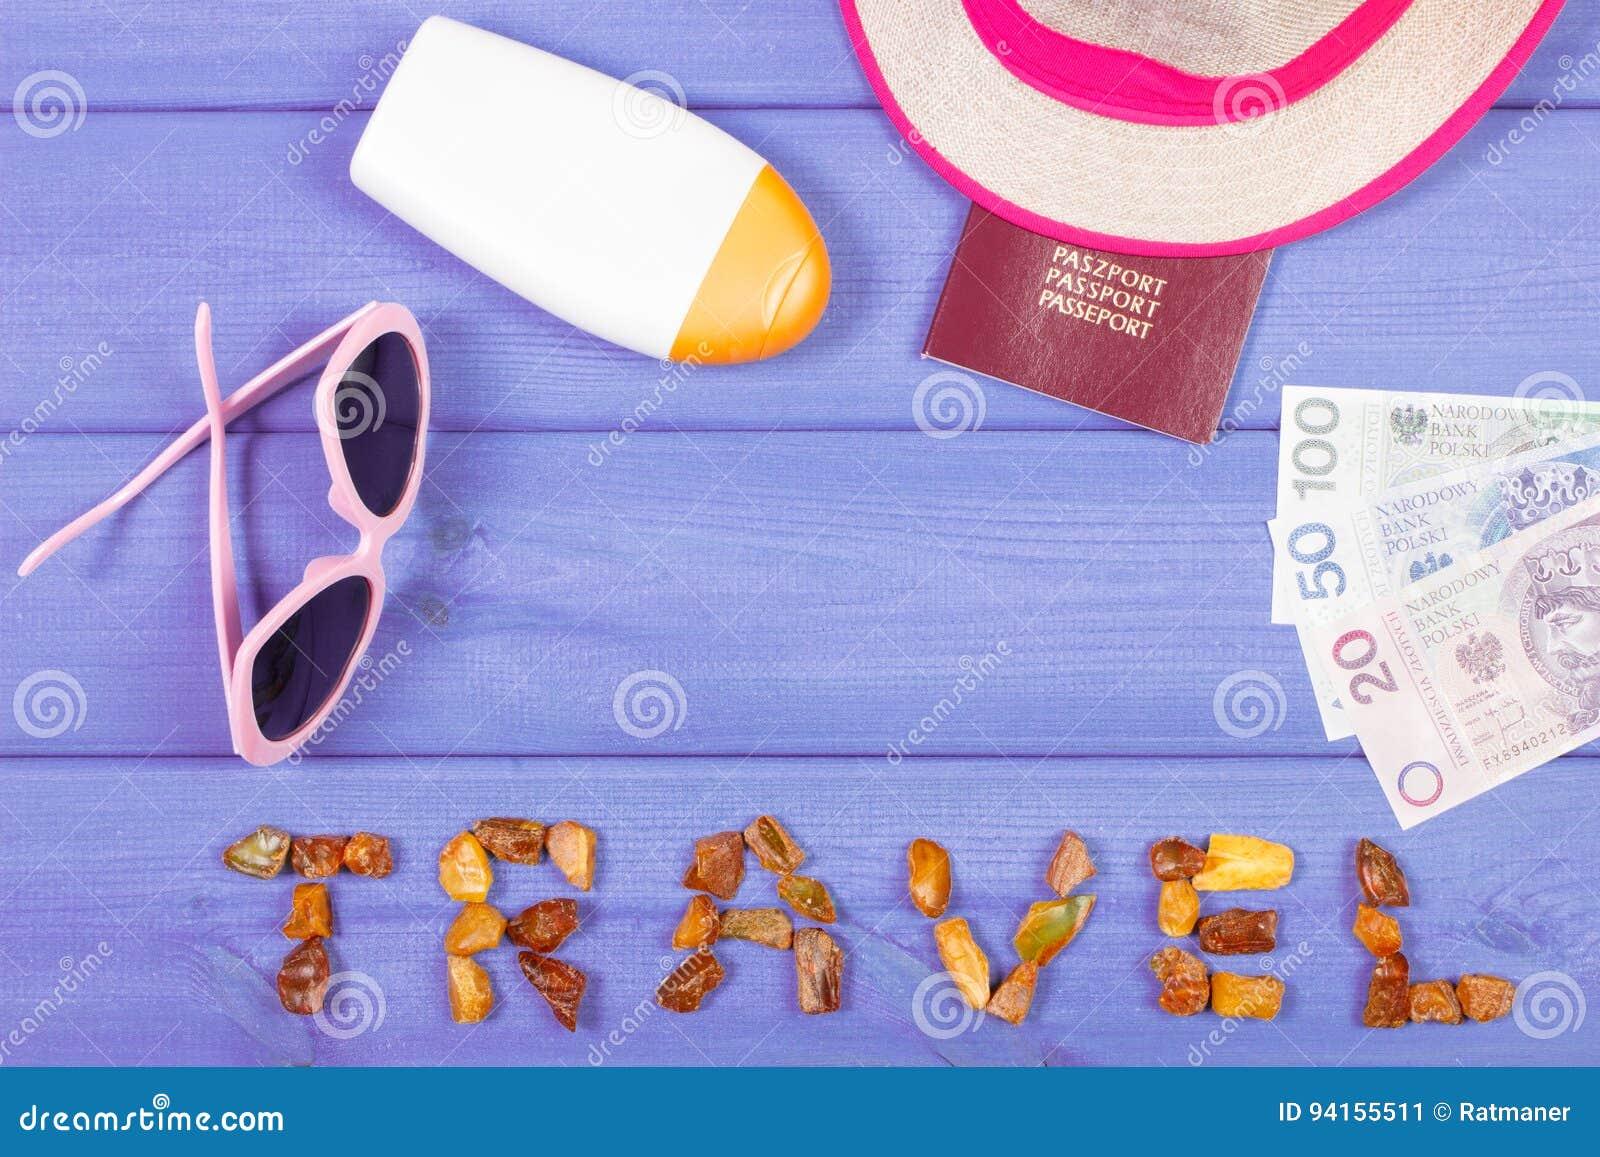 Word Travel Sunglasses Sun Lotion Straw Hat Passport And Polish